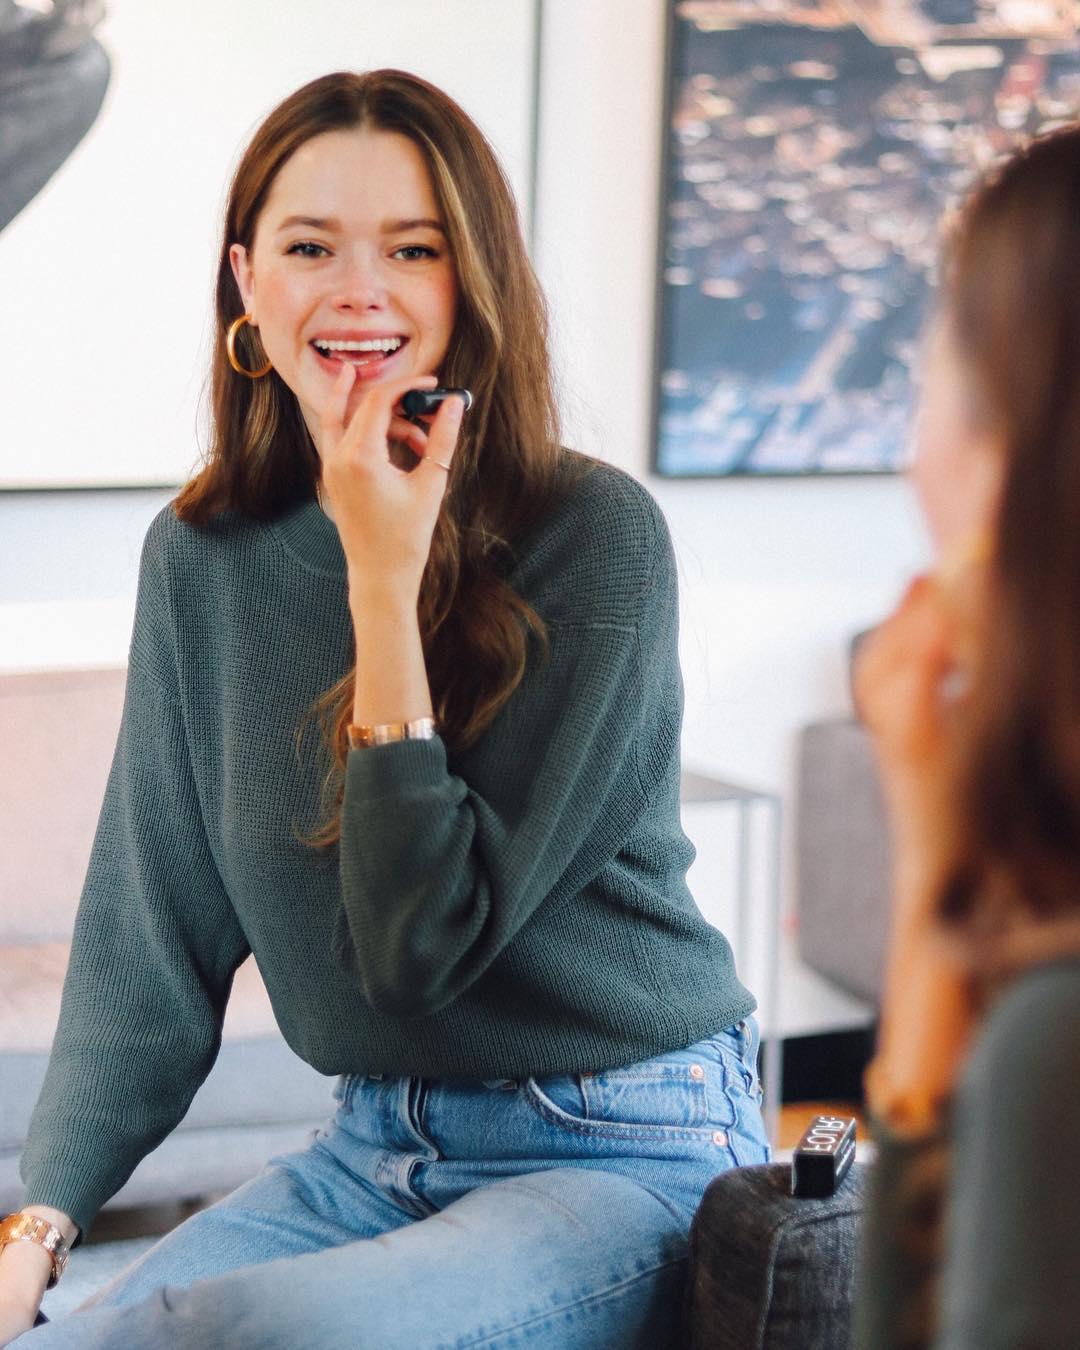 najpopularniji-beauty-proizvodi-valerialipovetsky